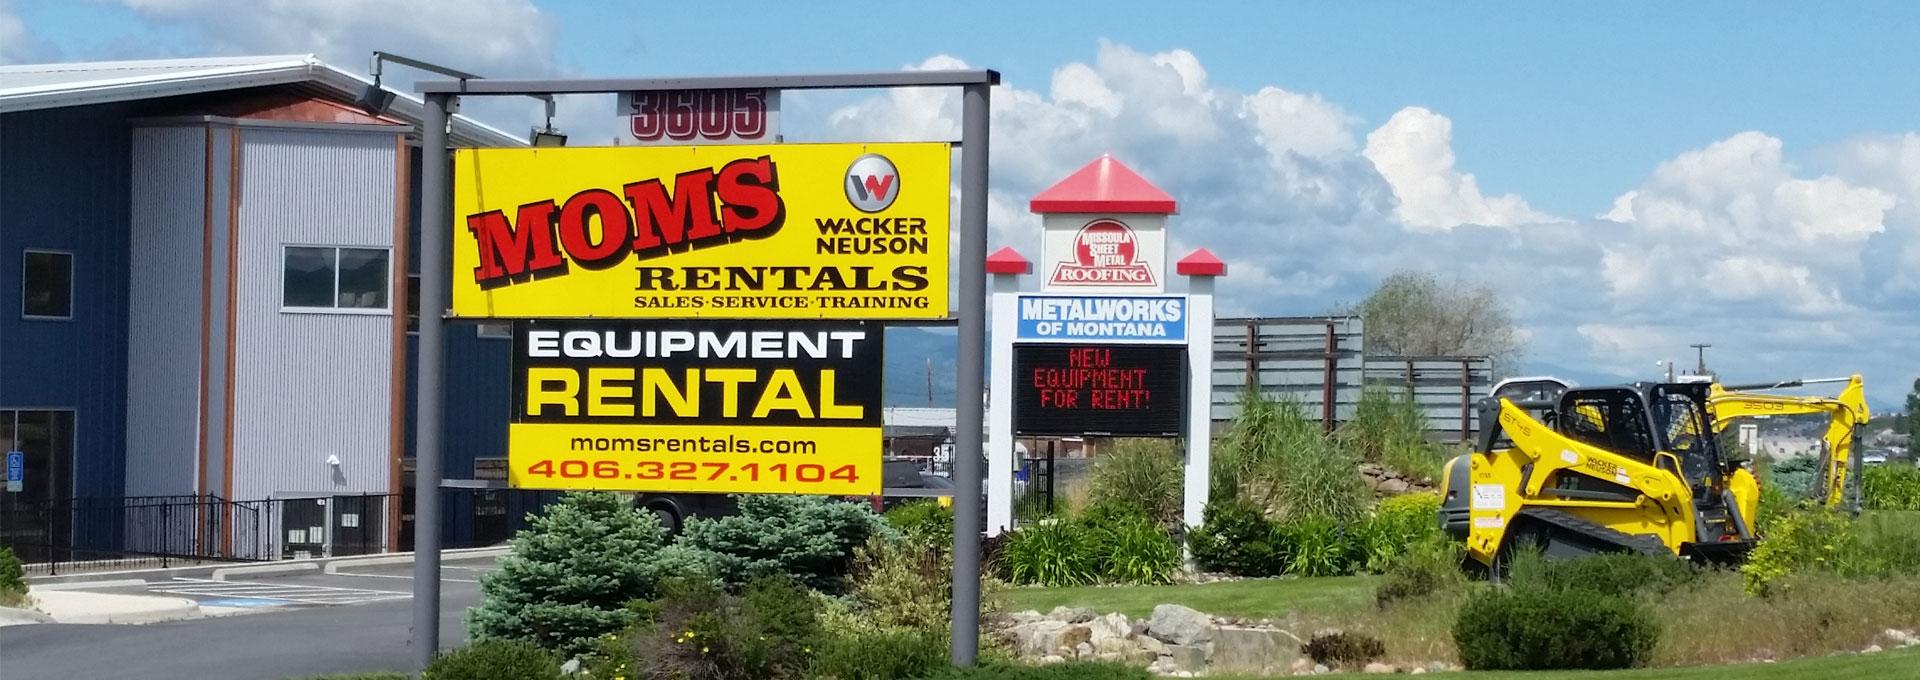 MOMS Rentals - Equipment Sales, Service, Rentals and Training